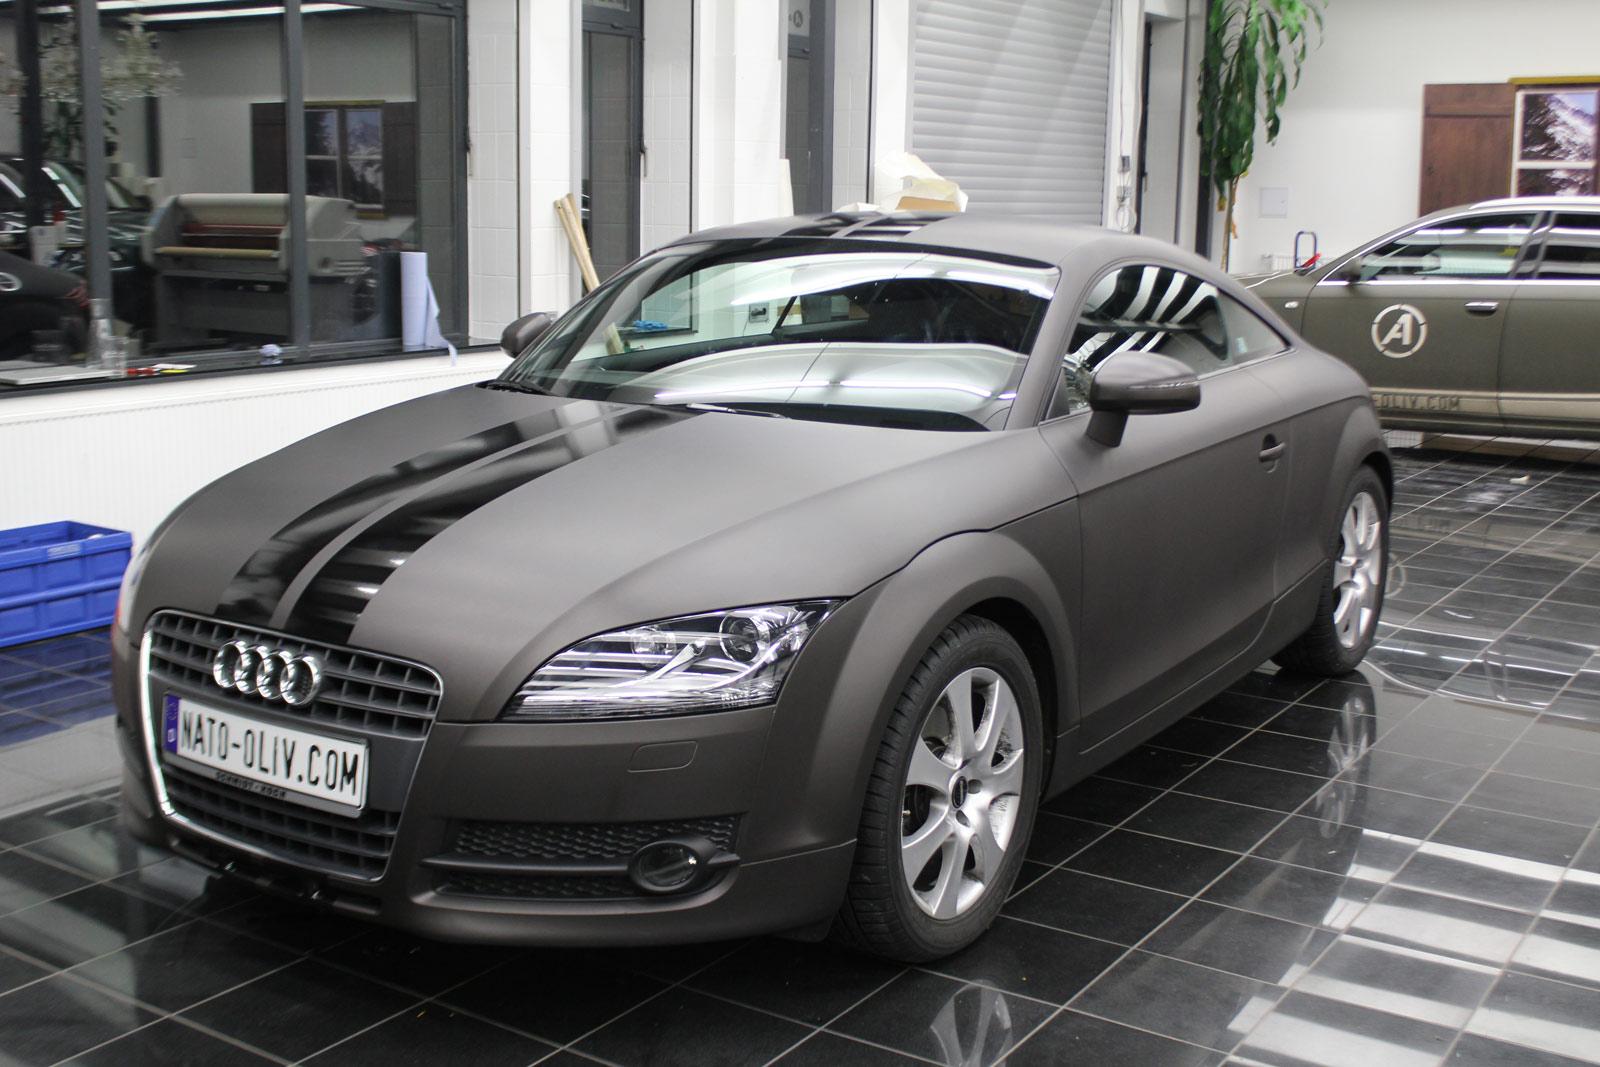 Audi_TT_Braun_Matt_Metallic_Branding_07